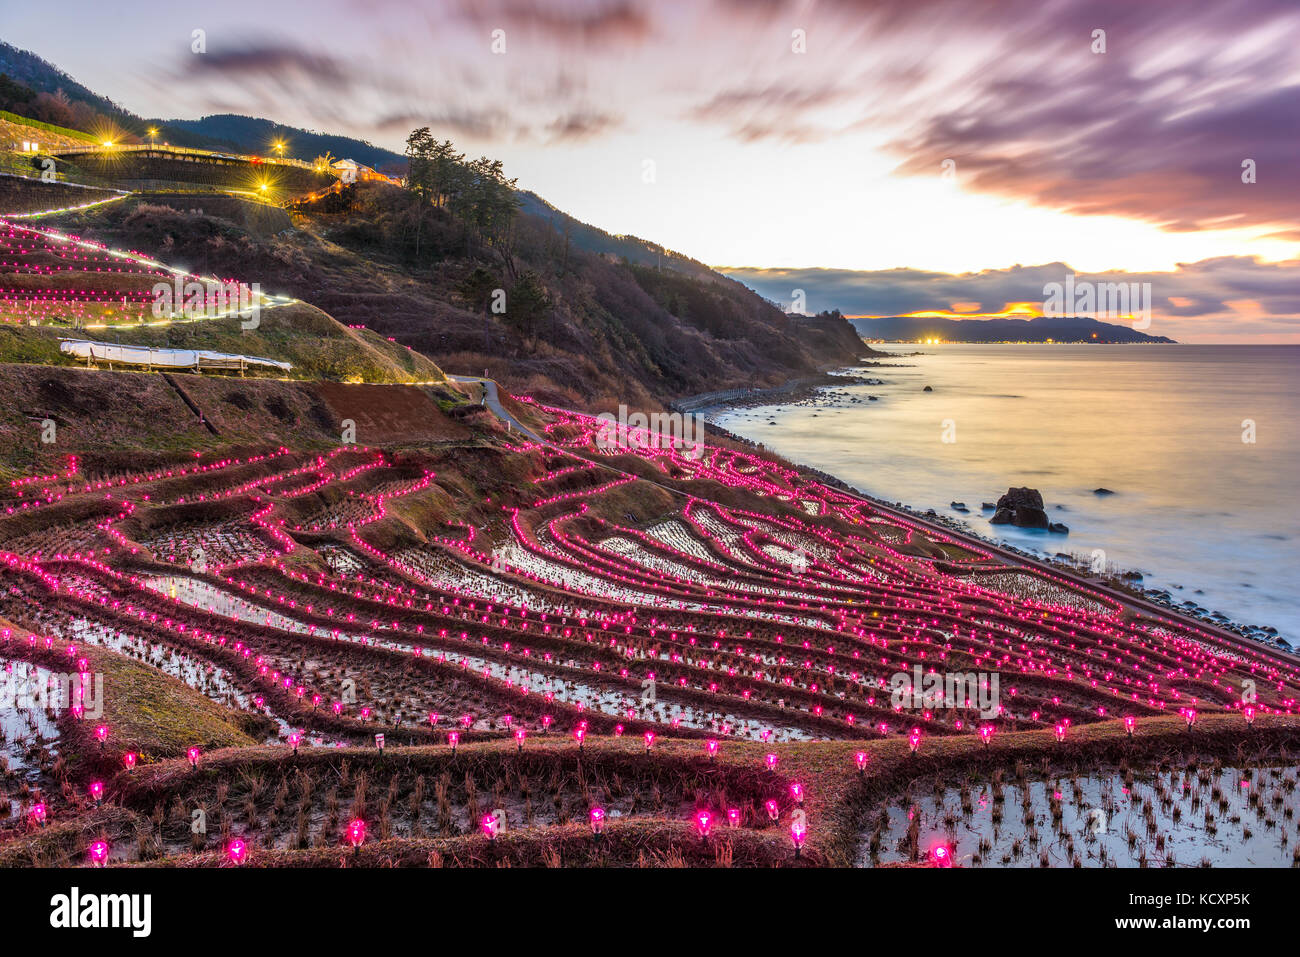 Wajima, japon à shiroyone les terrasses de riz de senmaida nuit s'allumer. Photo Stock